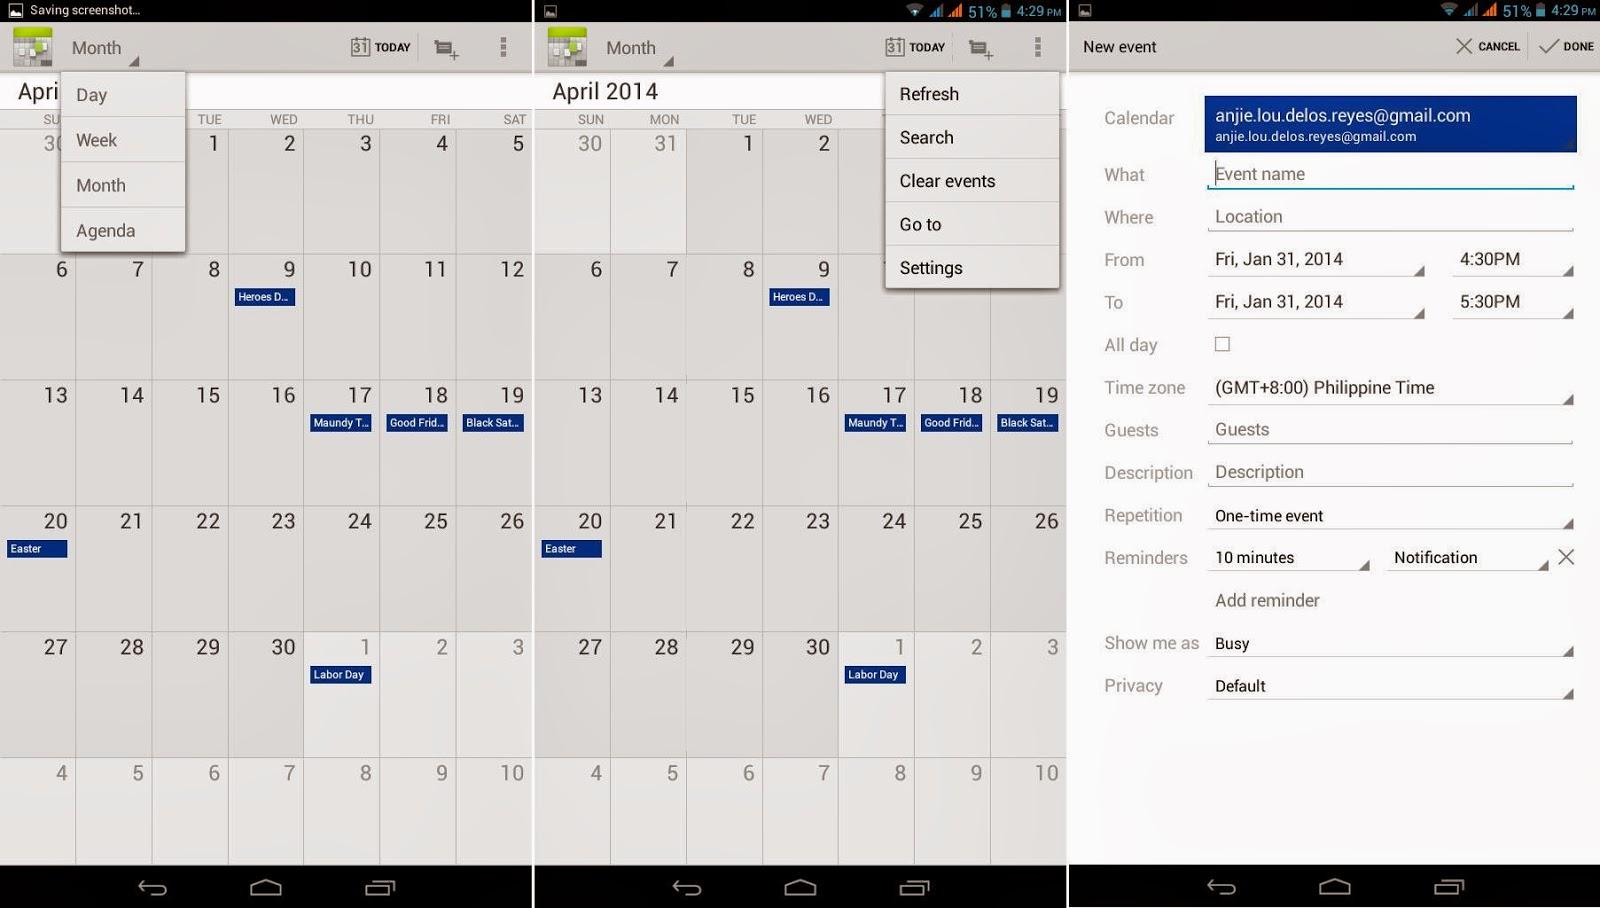 SKK Mobile Cyclops II Calendar